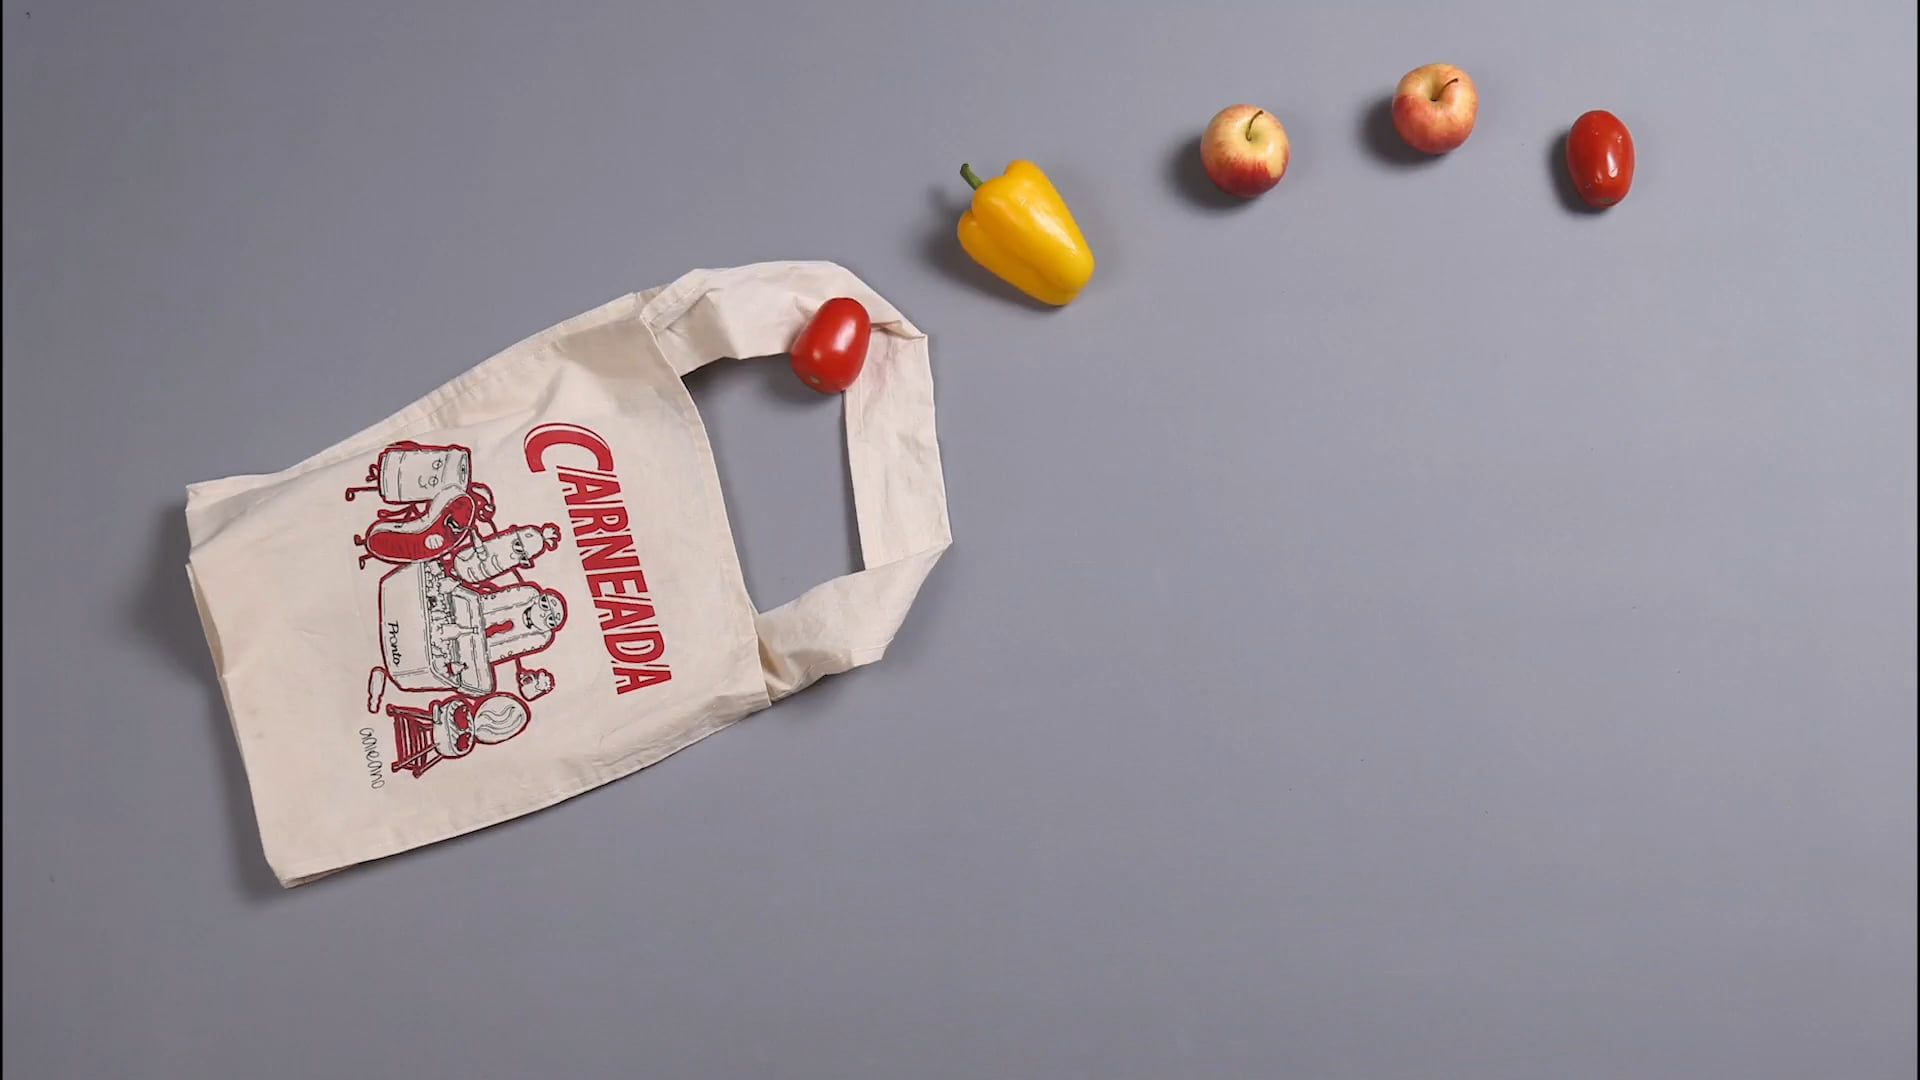 Reusable bag campaign for Pronto